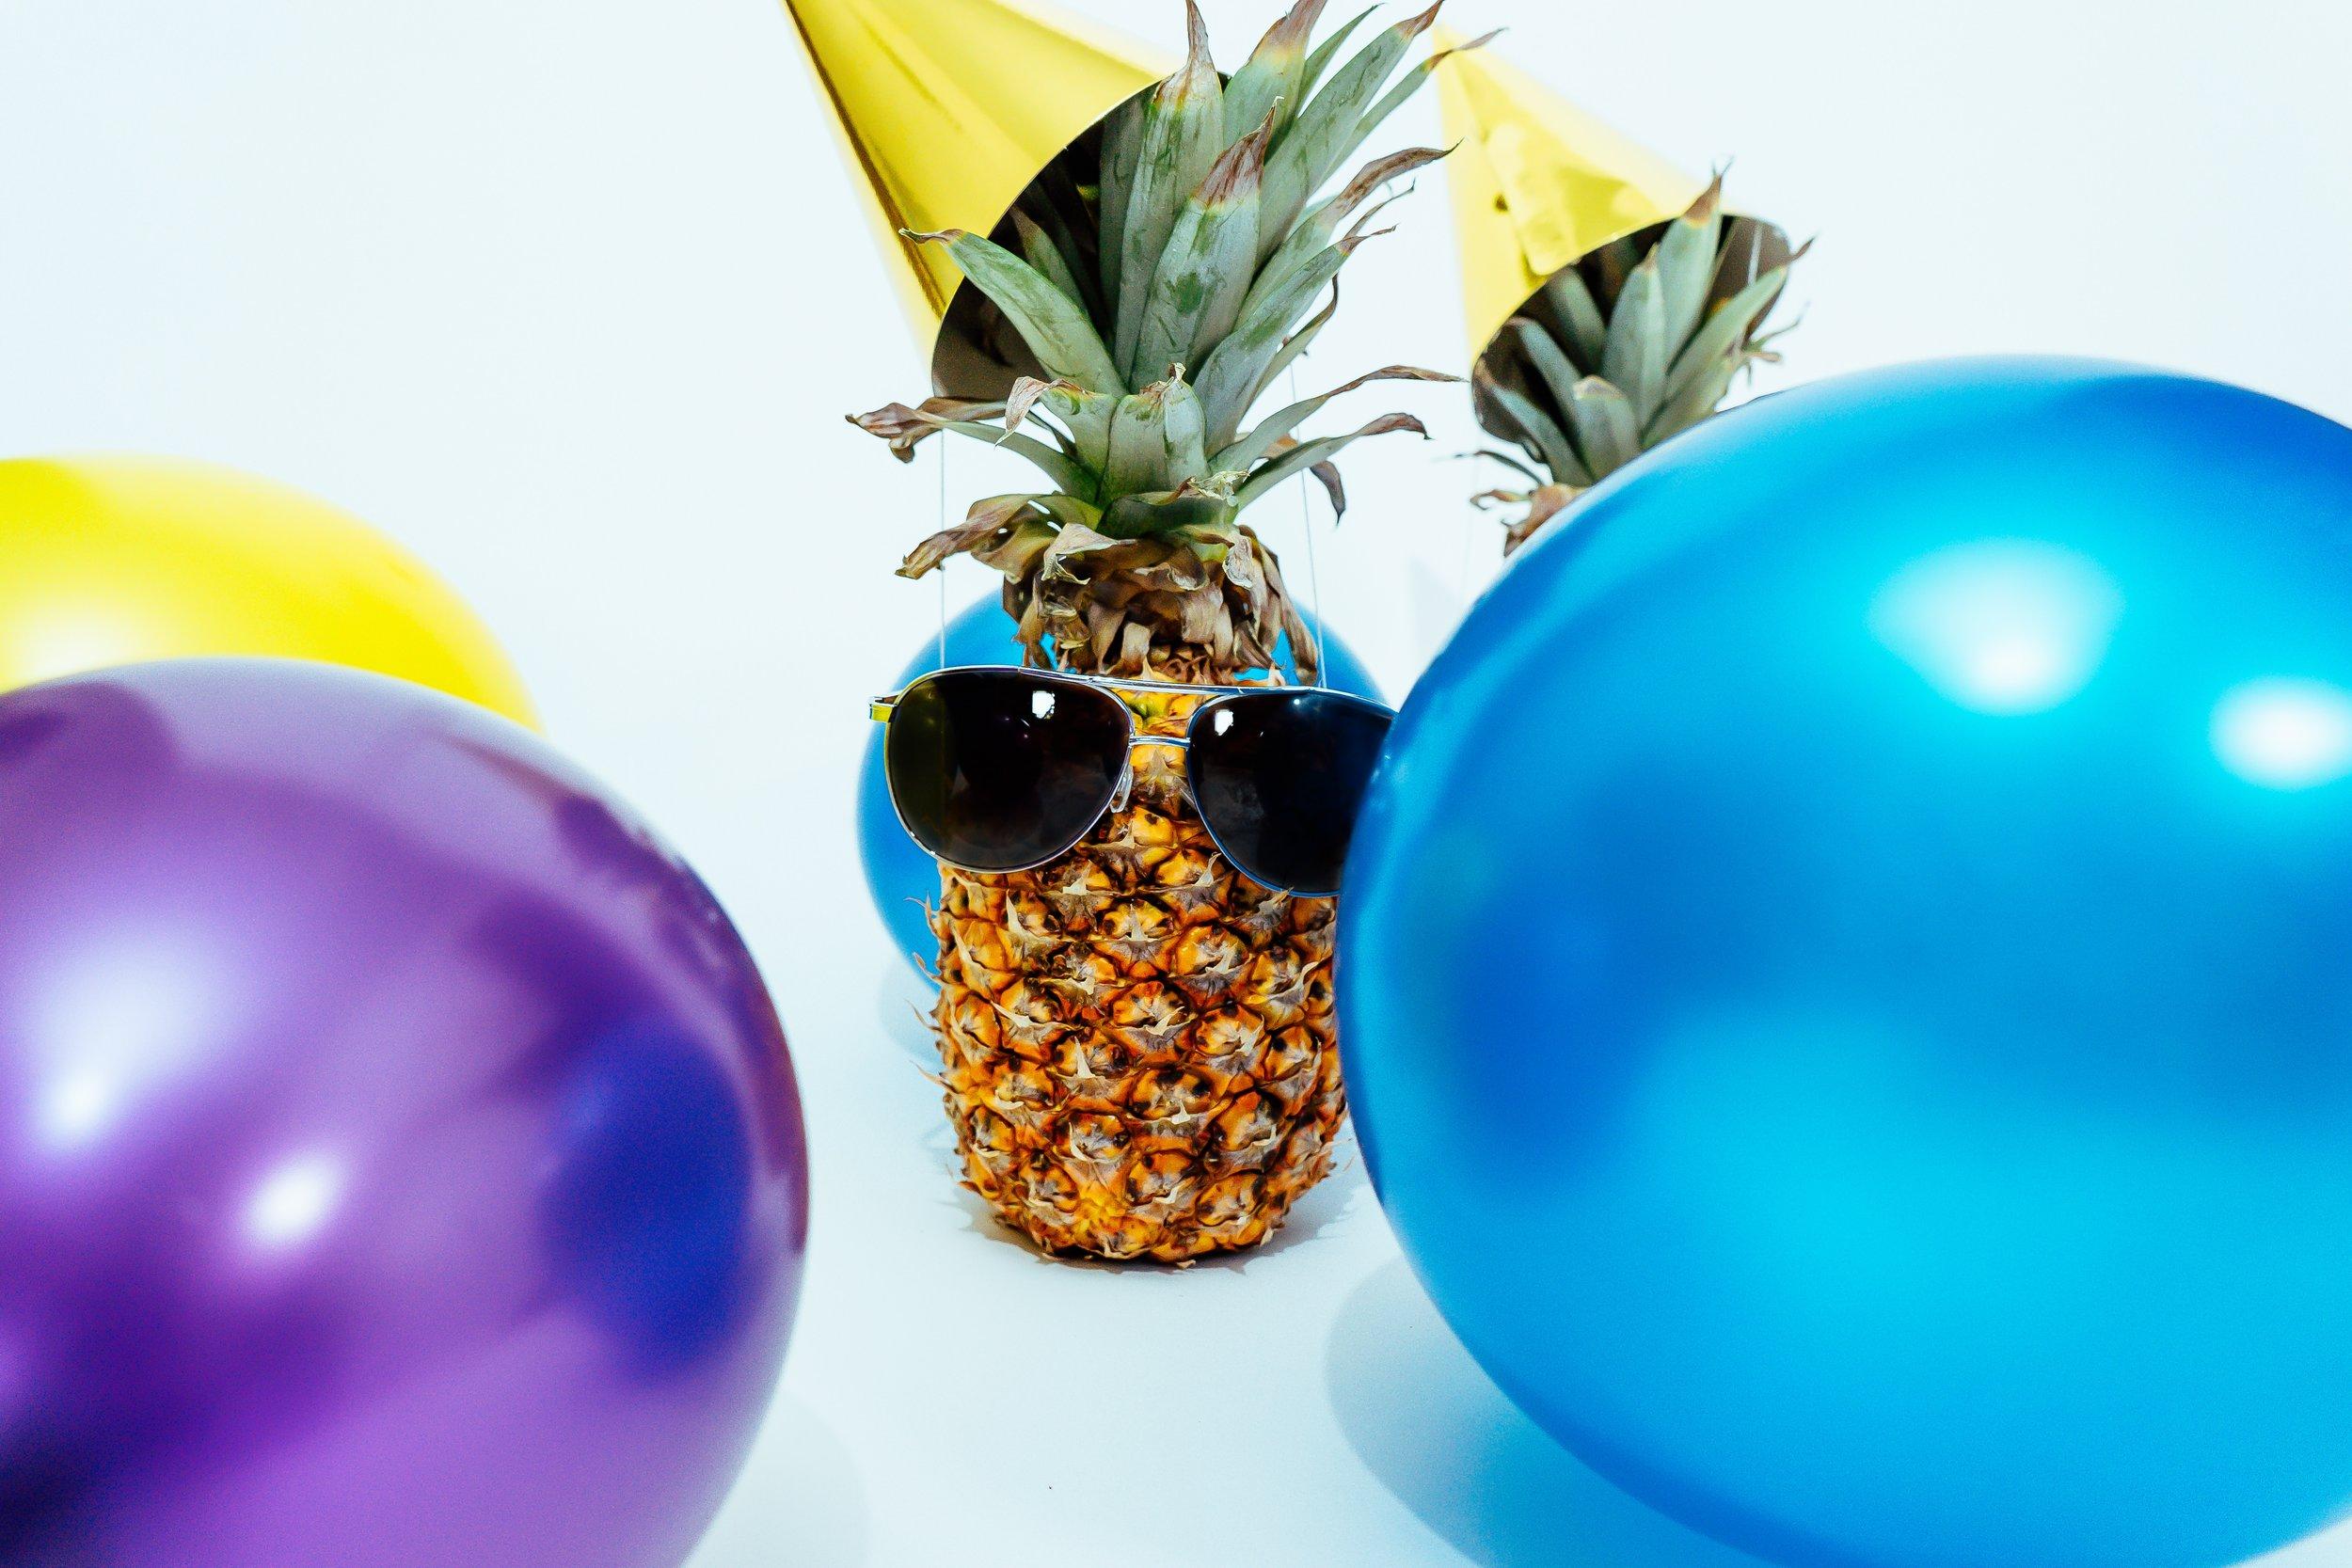 pineapple-supply-co-278187-unsplash.jpg